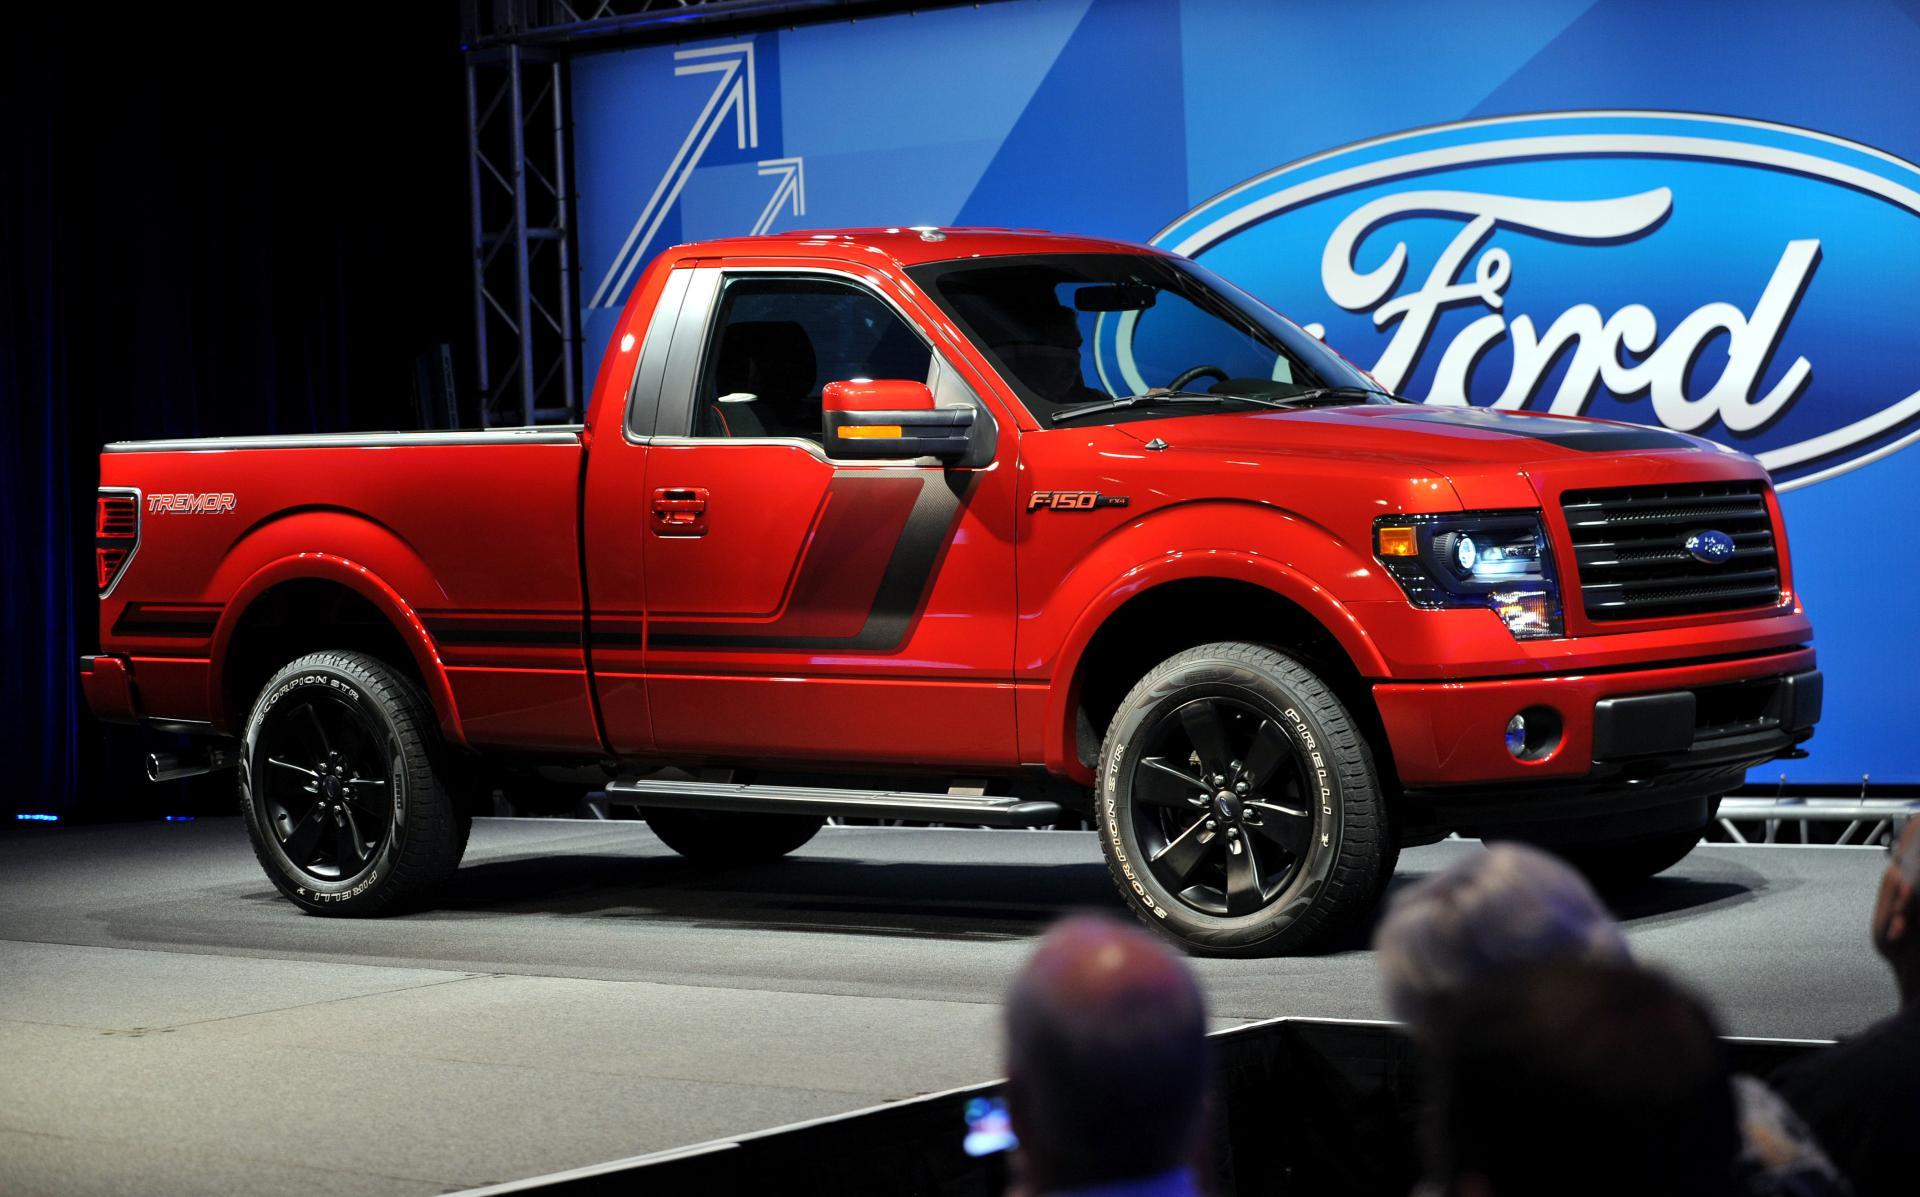 Awesome Ford Lightning Truck Wallpaper te Ford lightning